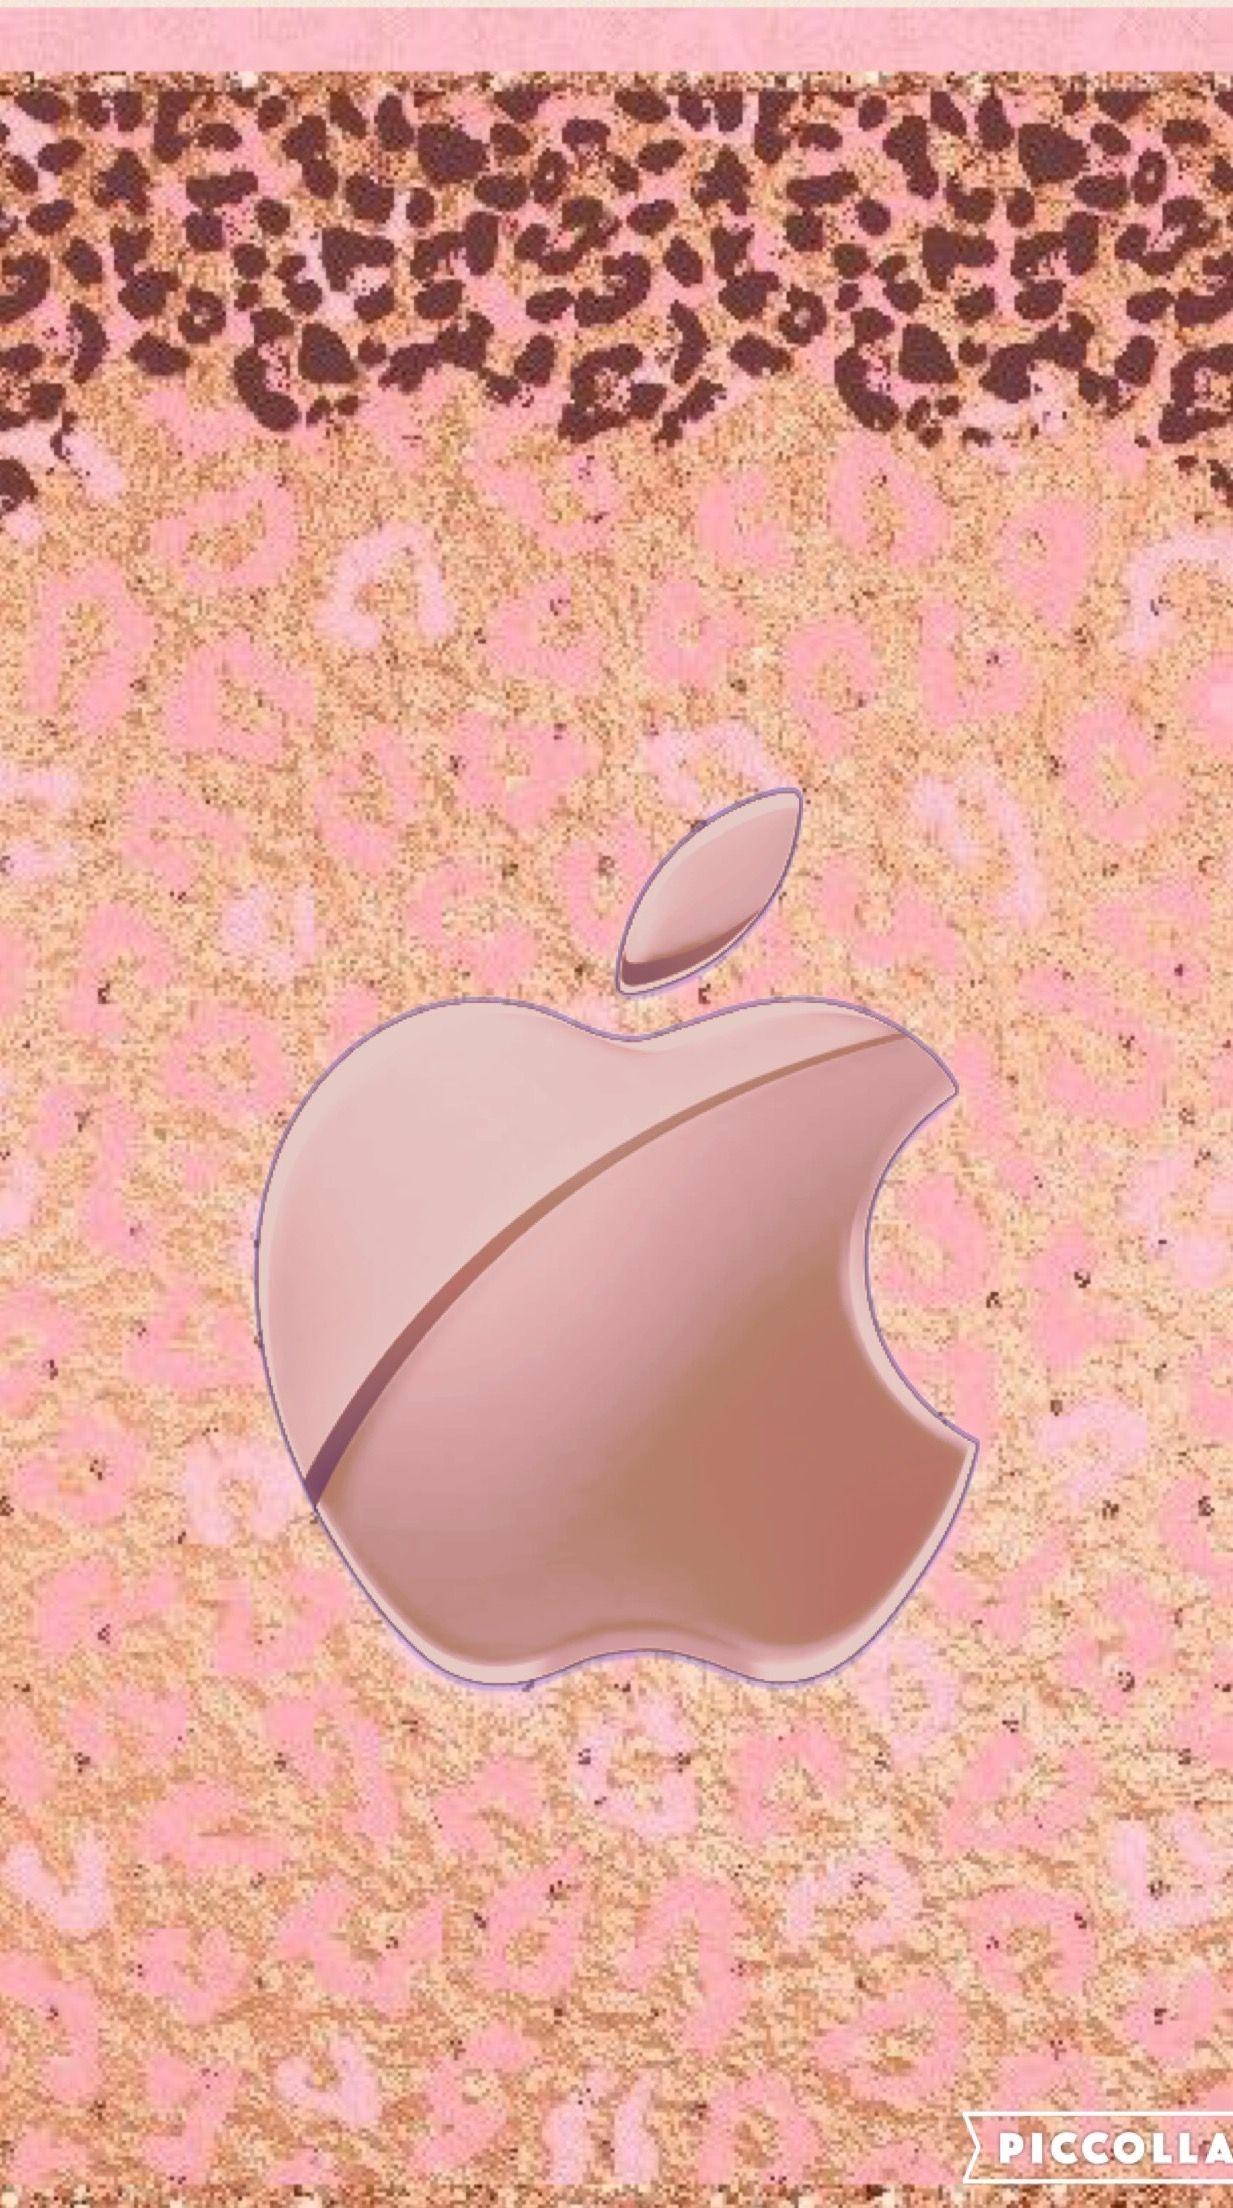 Apple Logo Lockscreen By Me Apple Wallpaper Apple Logo Wallpaper Iphone Pink Wallpaper Iphone